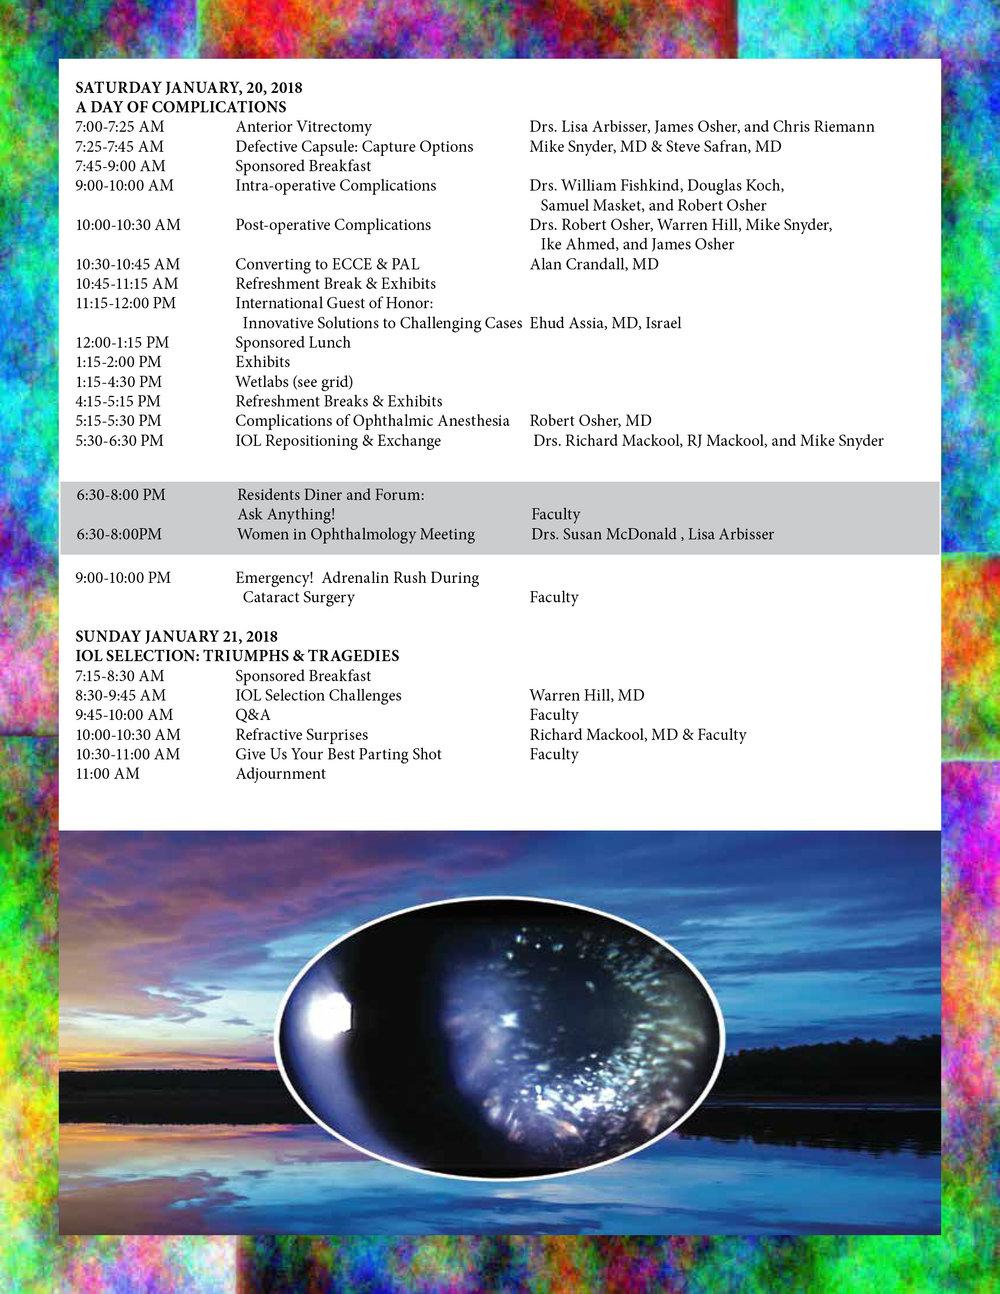 Agenda page 2.jpg